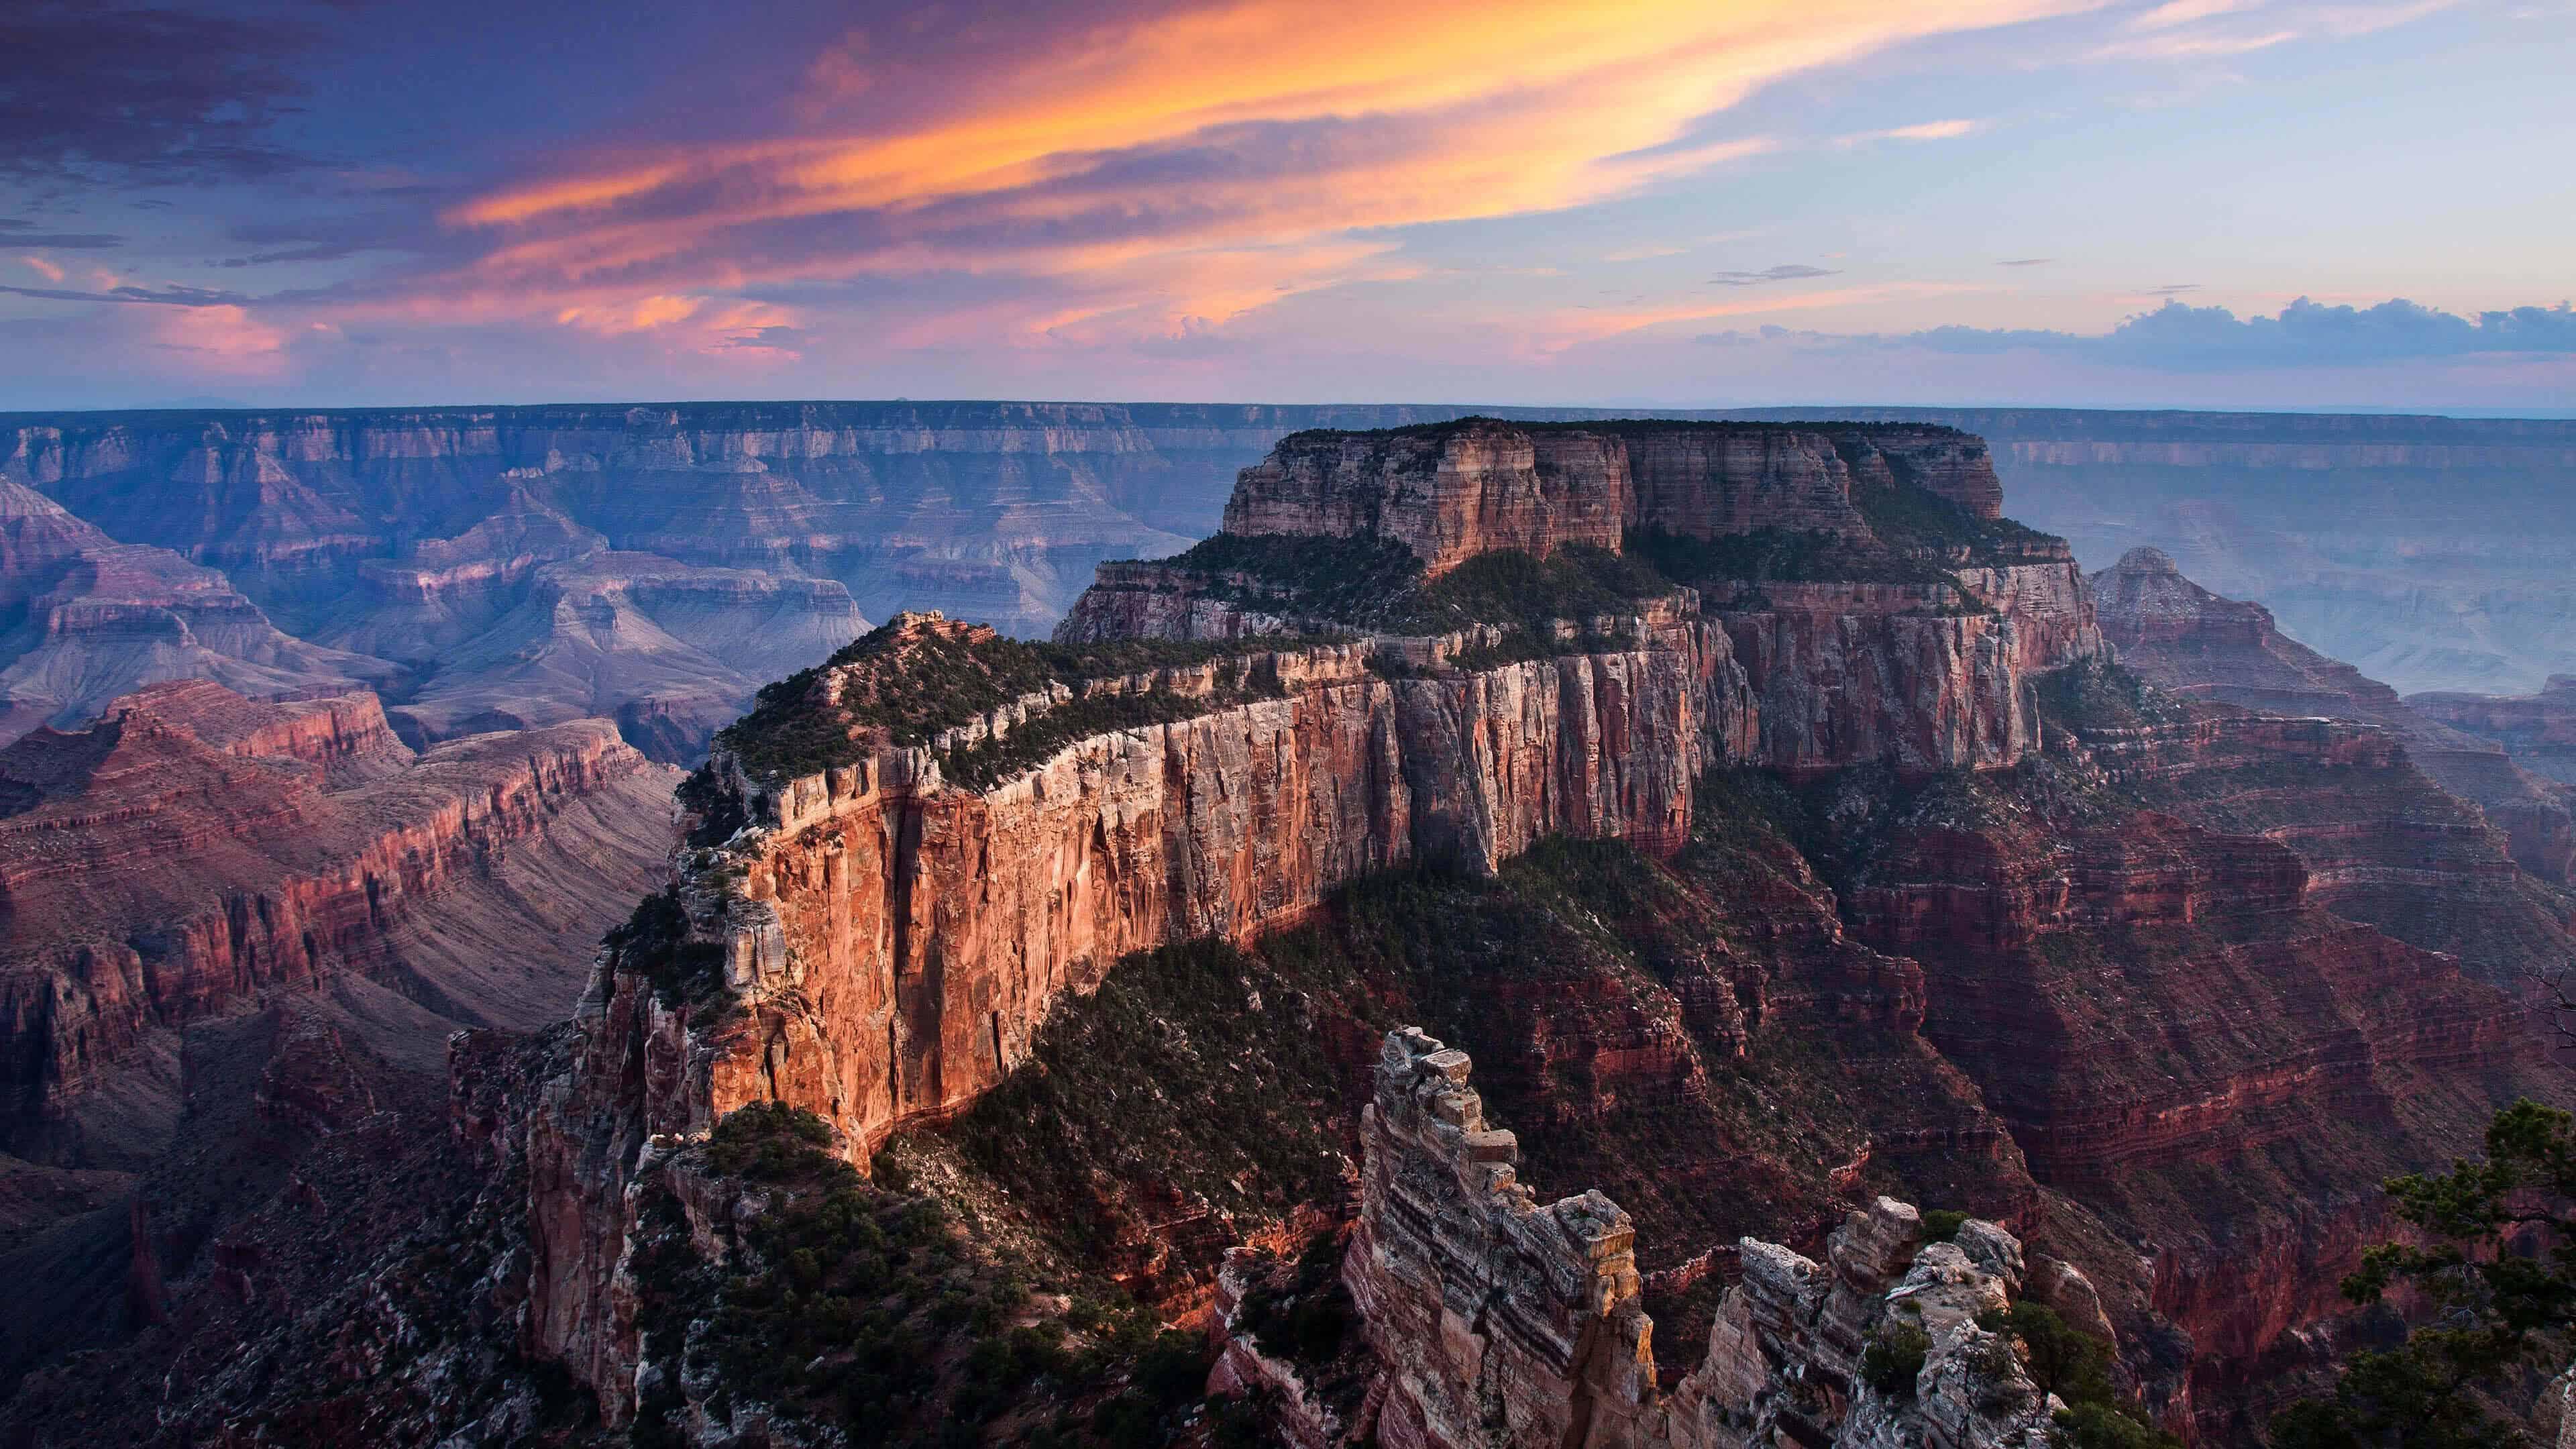 Moran Point Grand Canyon Arizona United States Uhd 4k